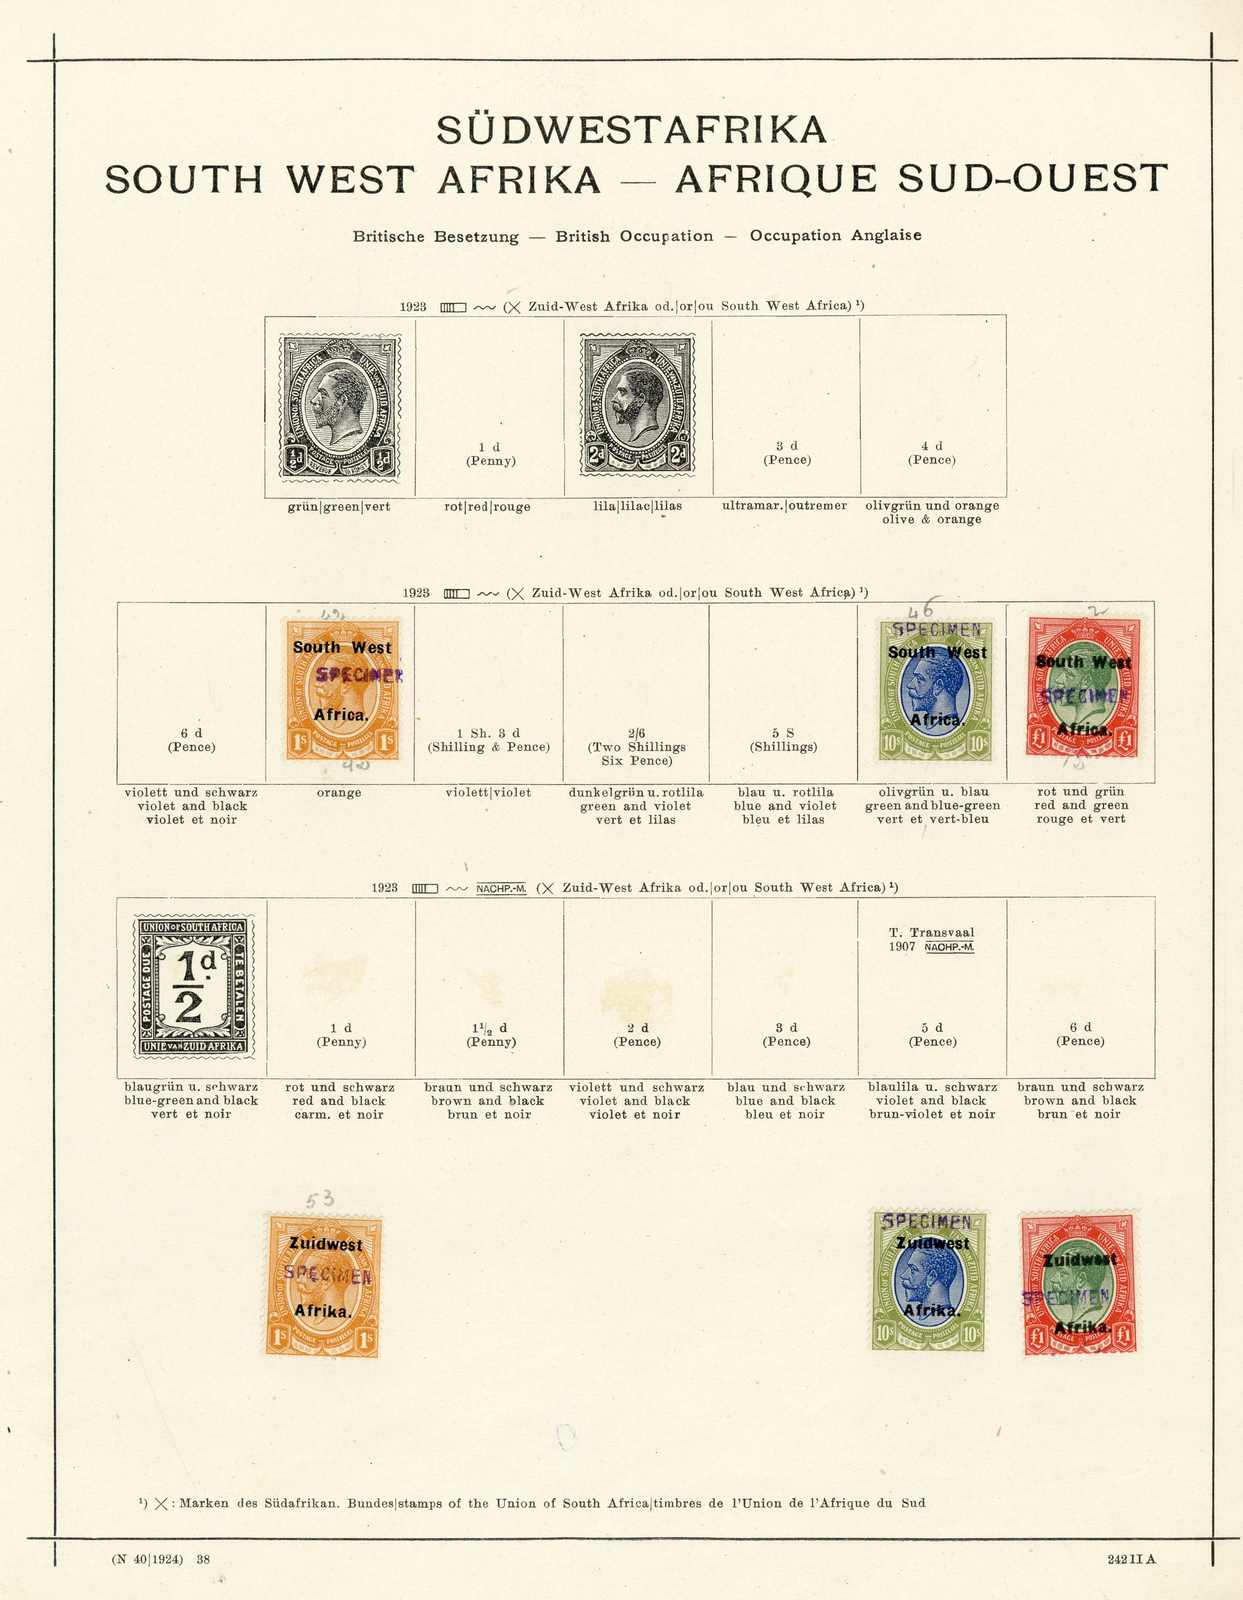 Lot 3033 - COLLECTIONS & ACCUMULATIONS south west africa -  Auktionshaus Schlegel 26 Public Auction